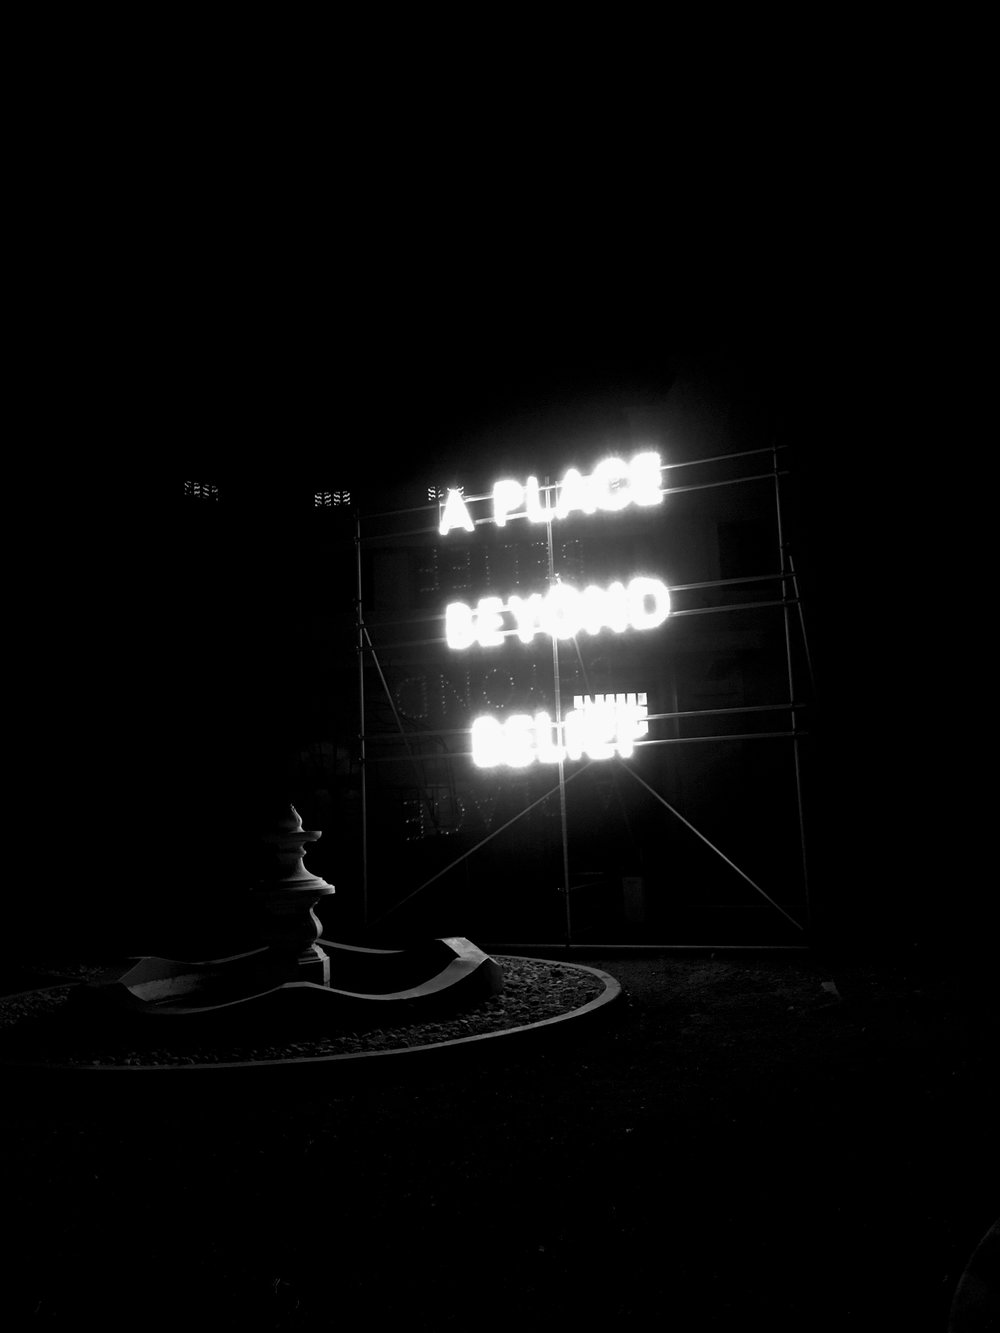 Sindhur_Photography_Kochi Muziris Biennale -2019-48.JPG